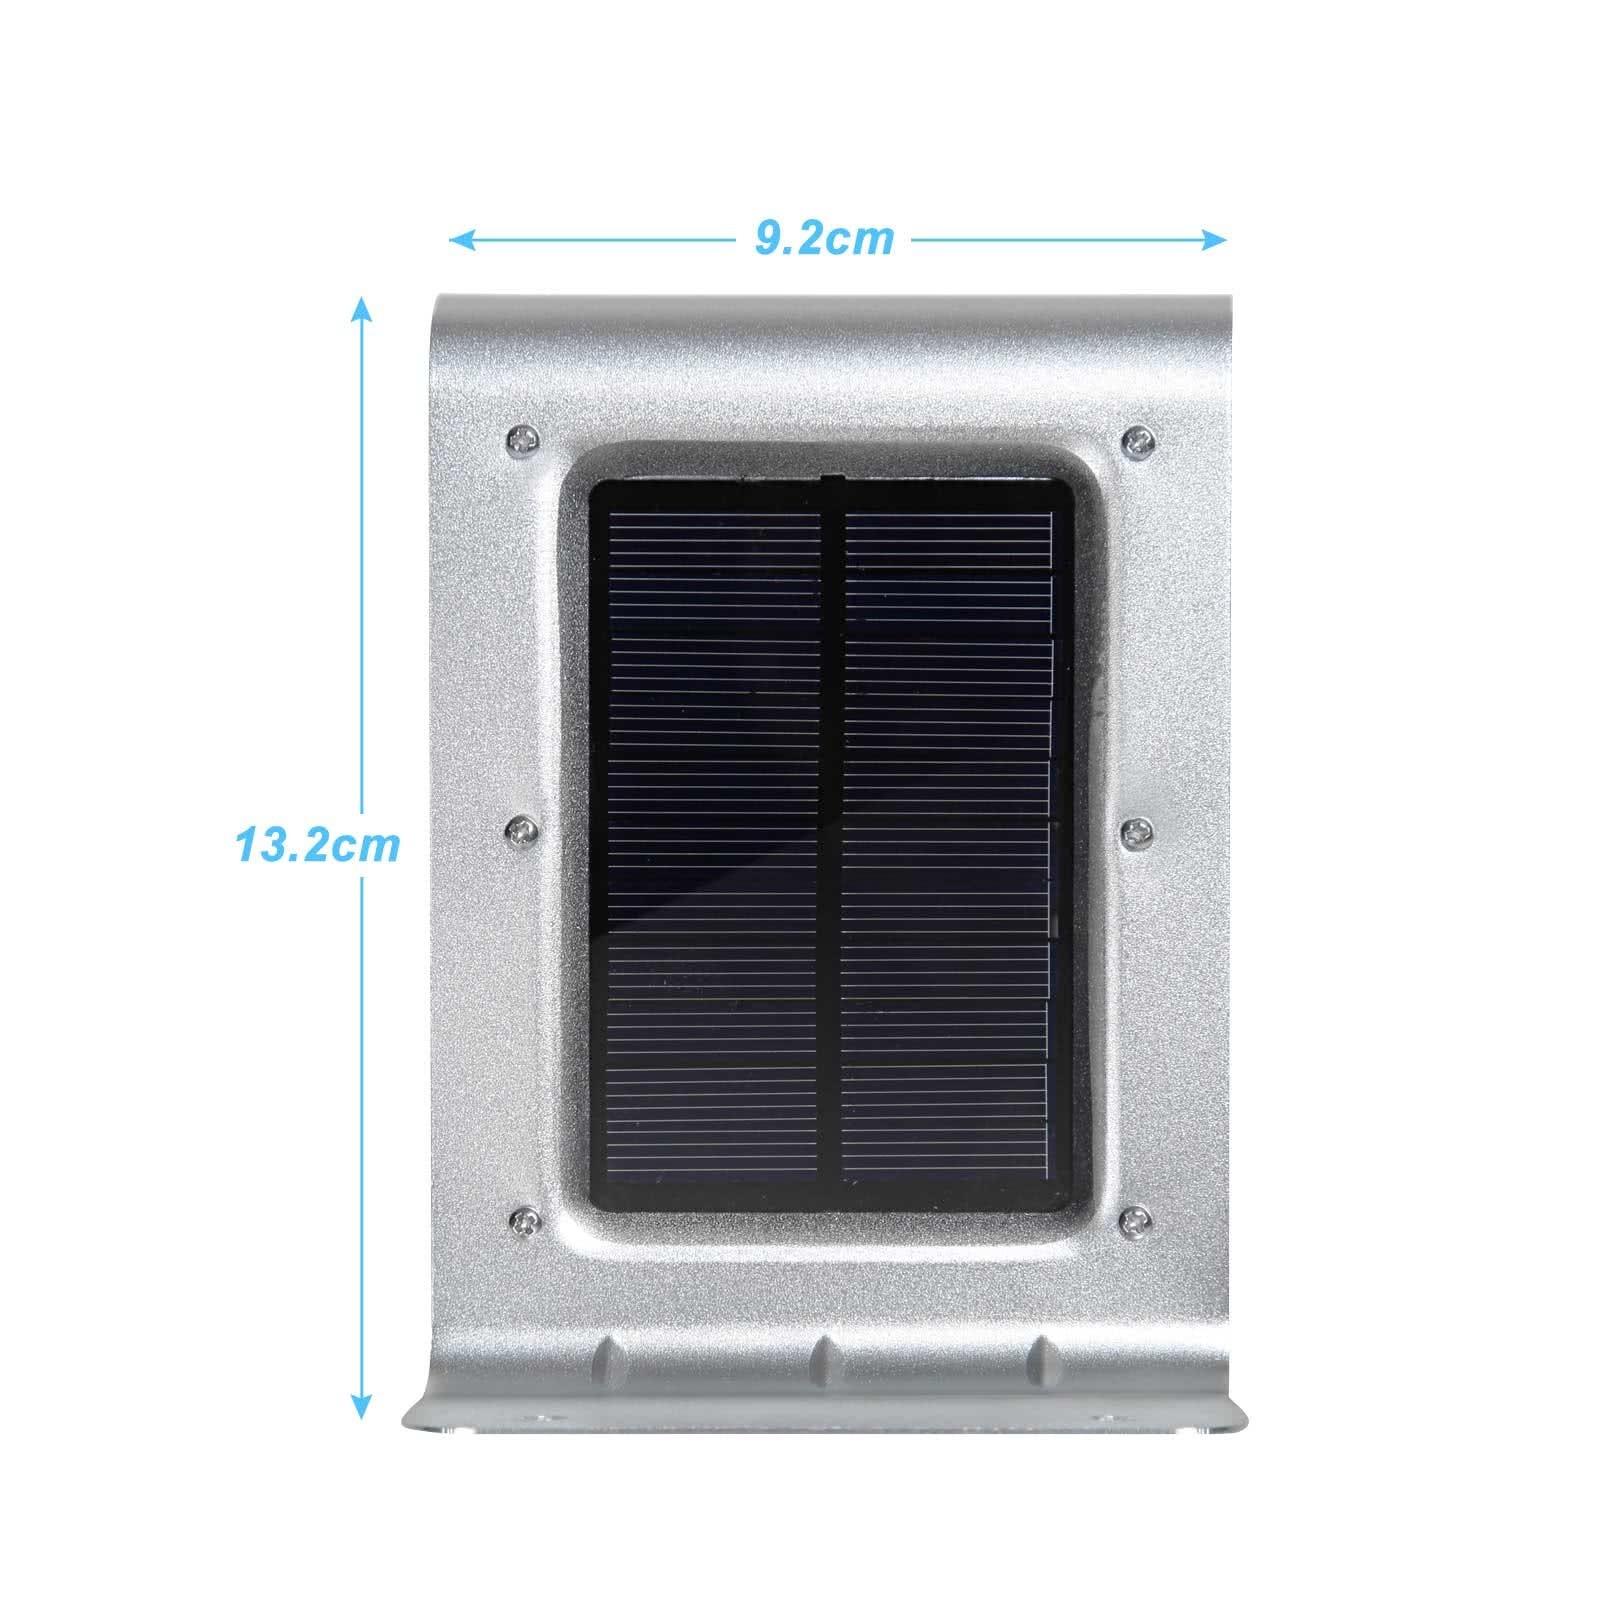 led solar wandleuchte sensor mit bewegungsmelder solarlampe wandleuchte au en licht. Black Bedroom Furniture Sets. Home Design Ideas